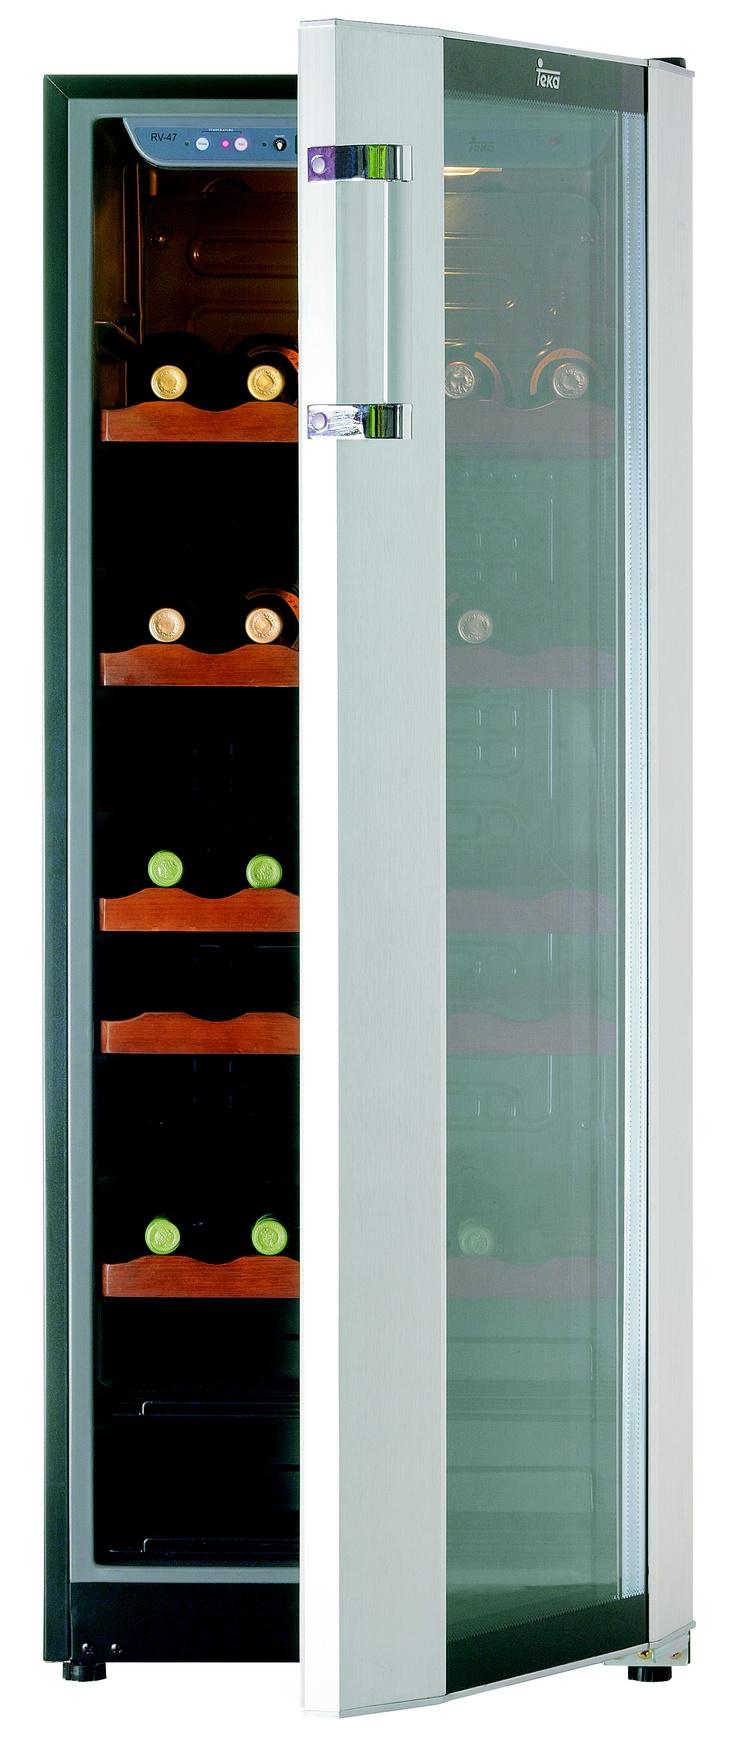 17 mejores ideas sobre estantes de vino en pinterest pallet ideas decoraci n de casa de - Estantes para vinos ...